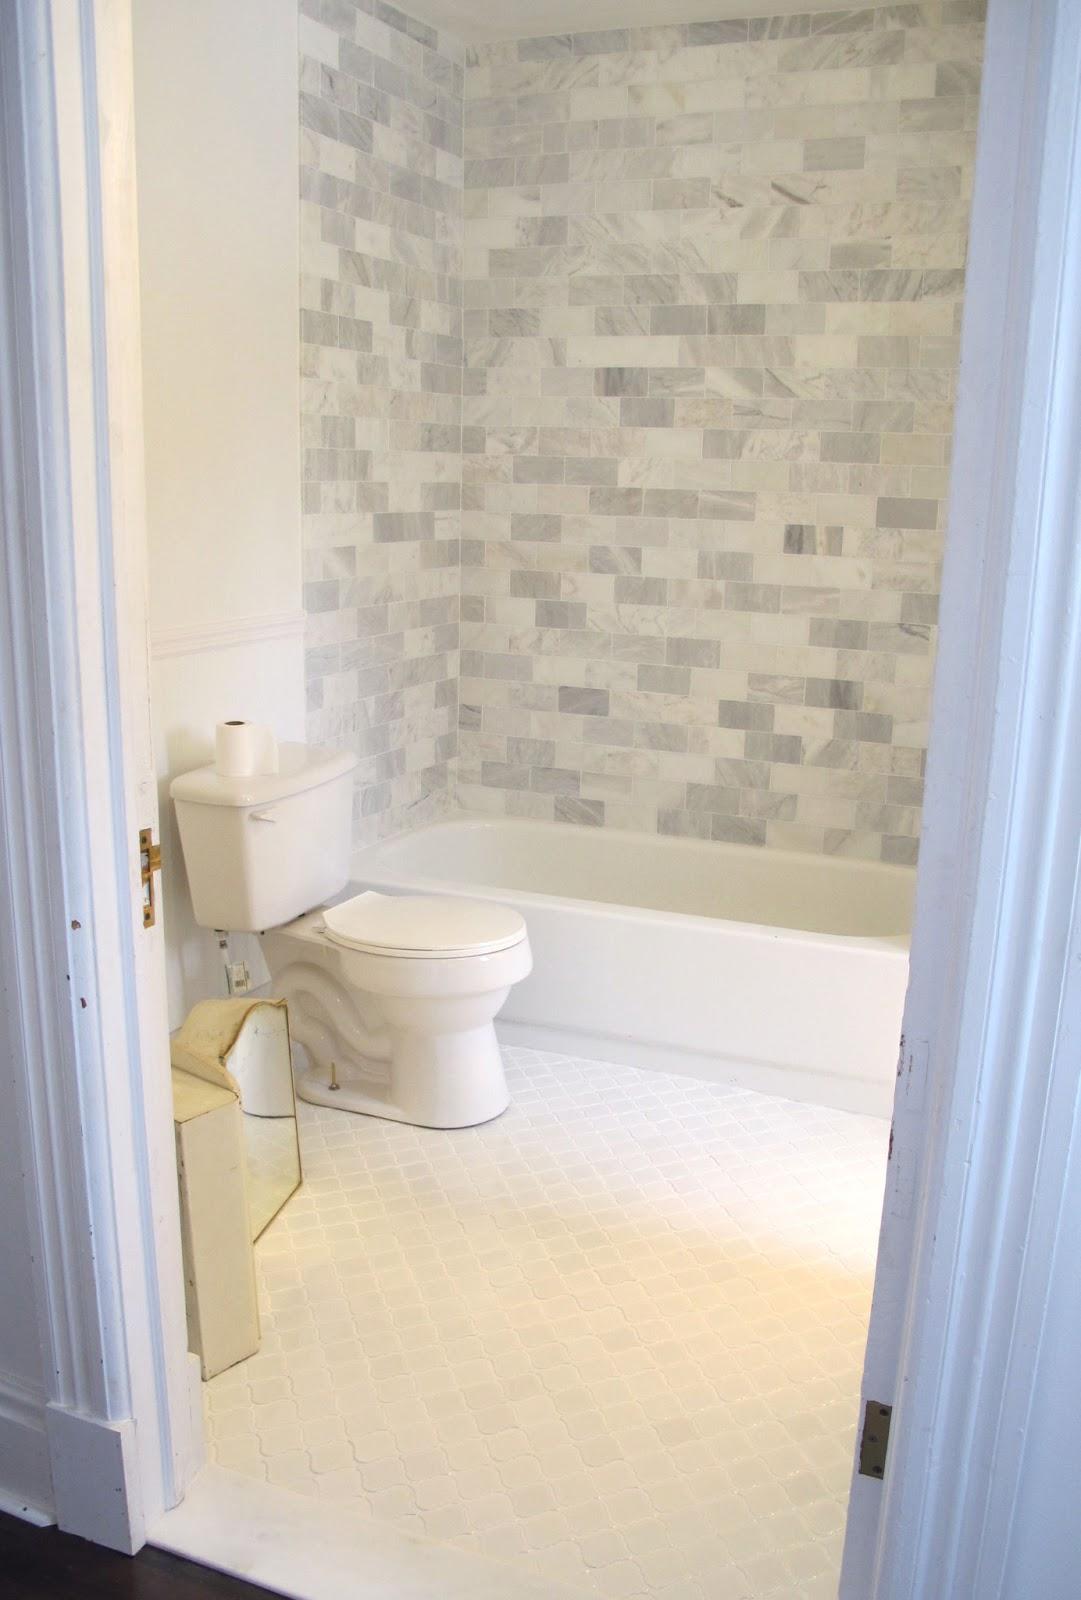 31 Amazing Ideas For Marble Tile For Bathroom Floors 2019